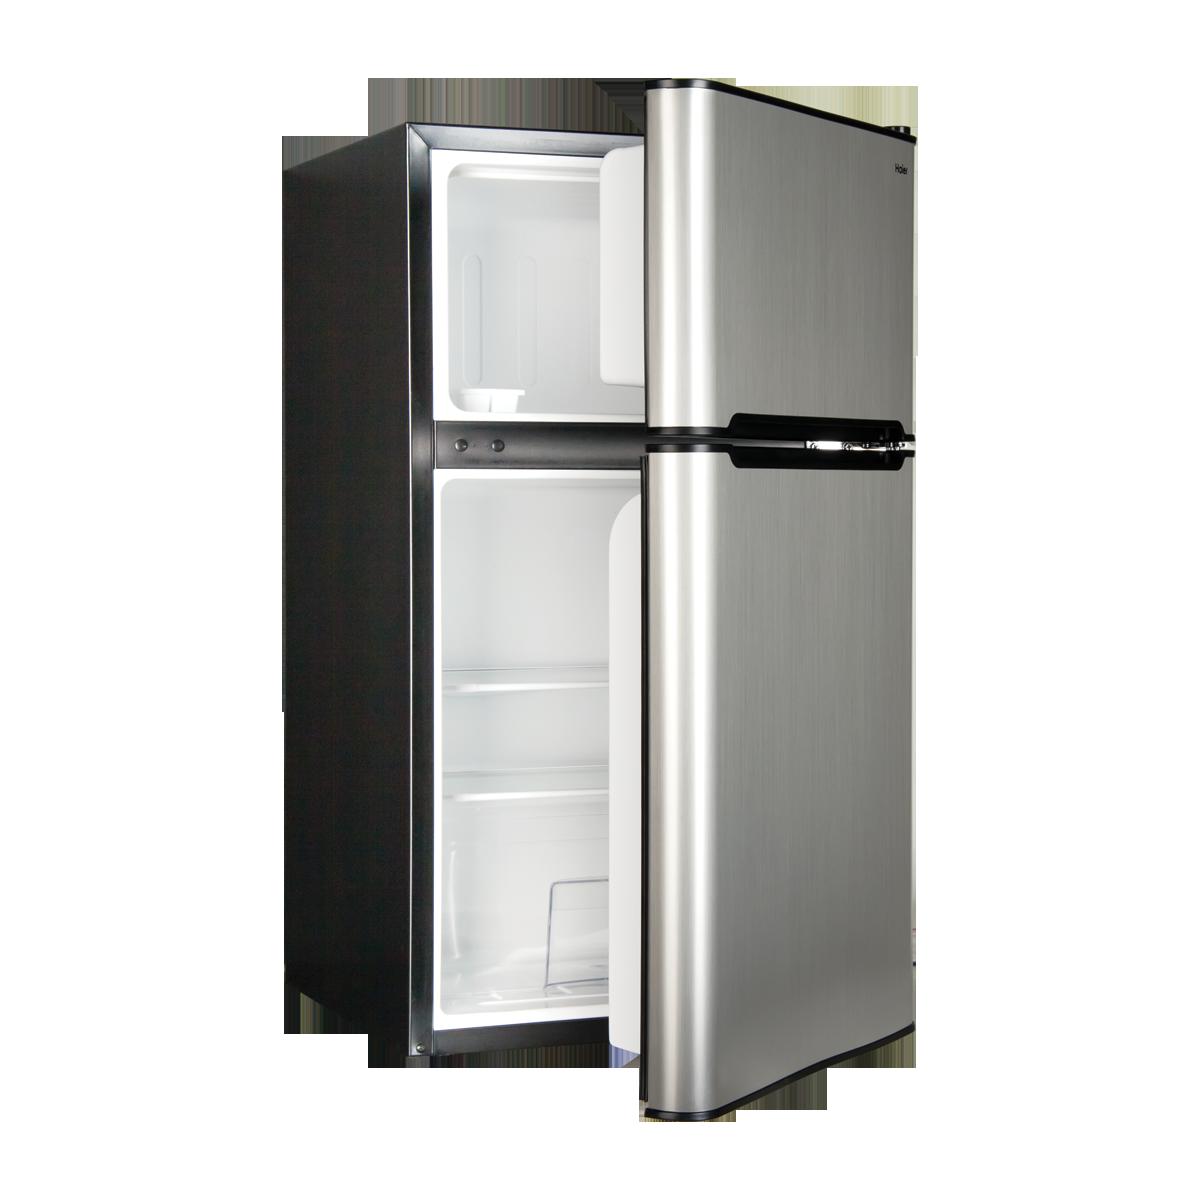 Refrigerator Png Image Refrigerator Refrigerator Png Compact Refrigerator Freezer